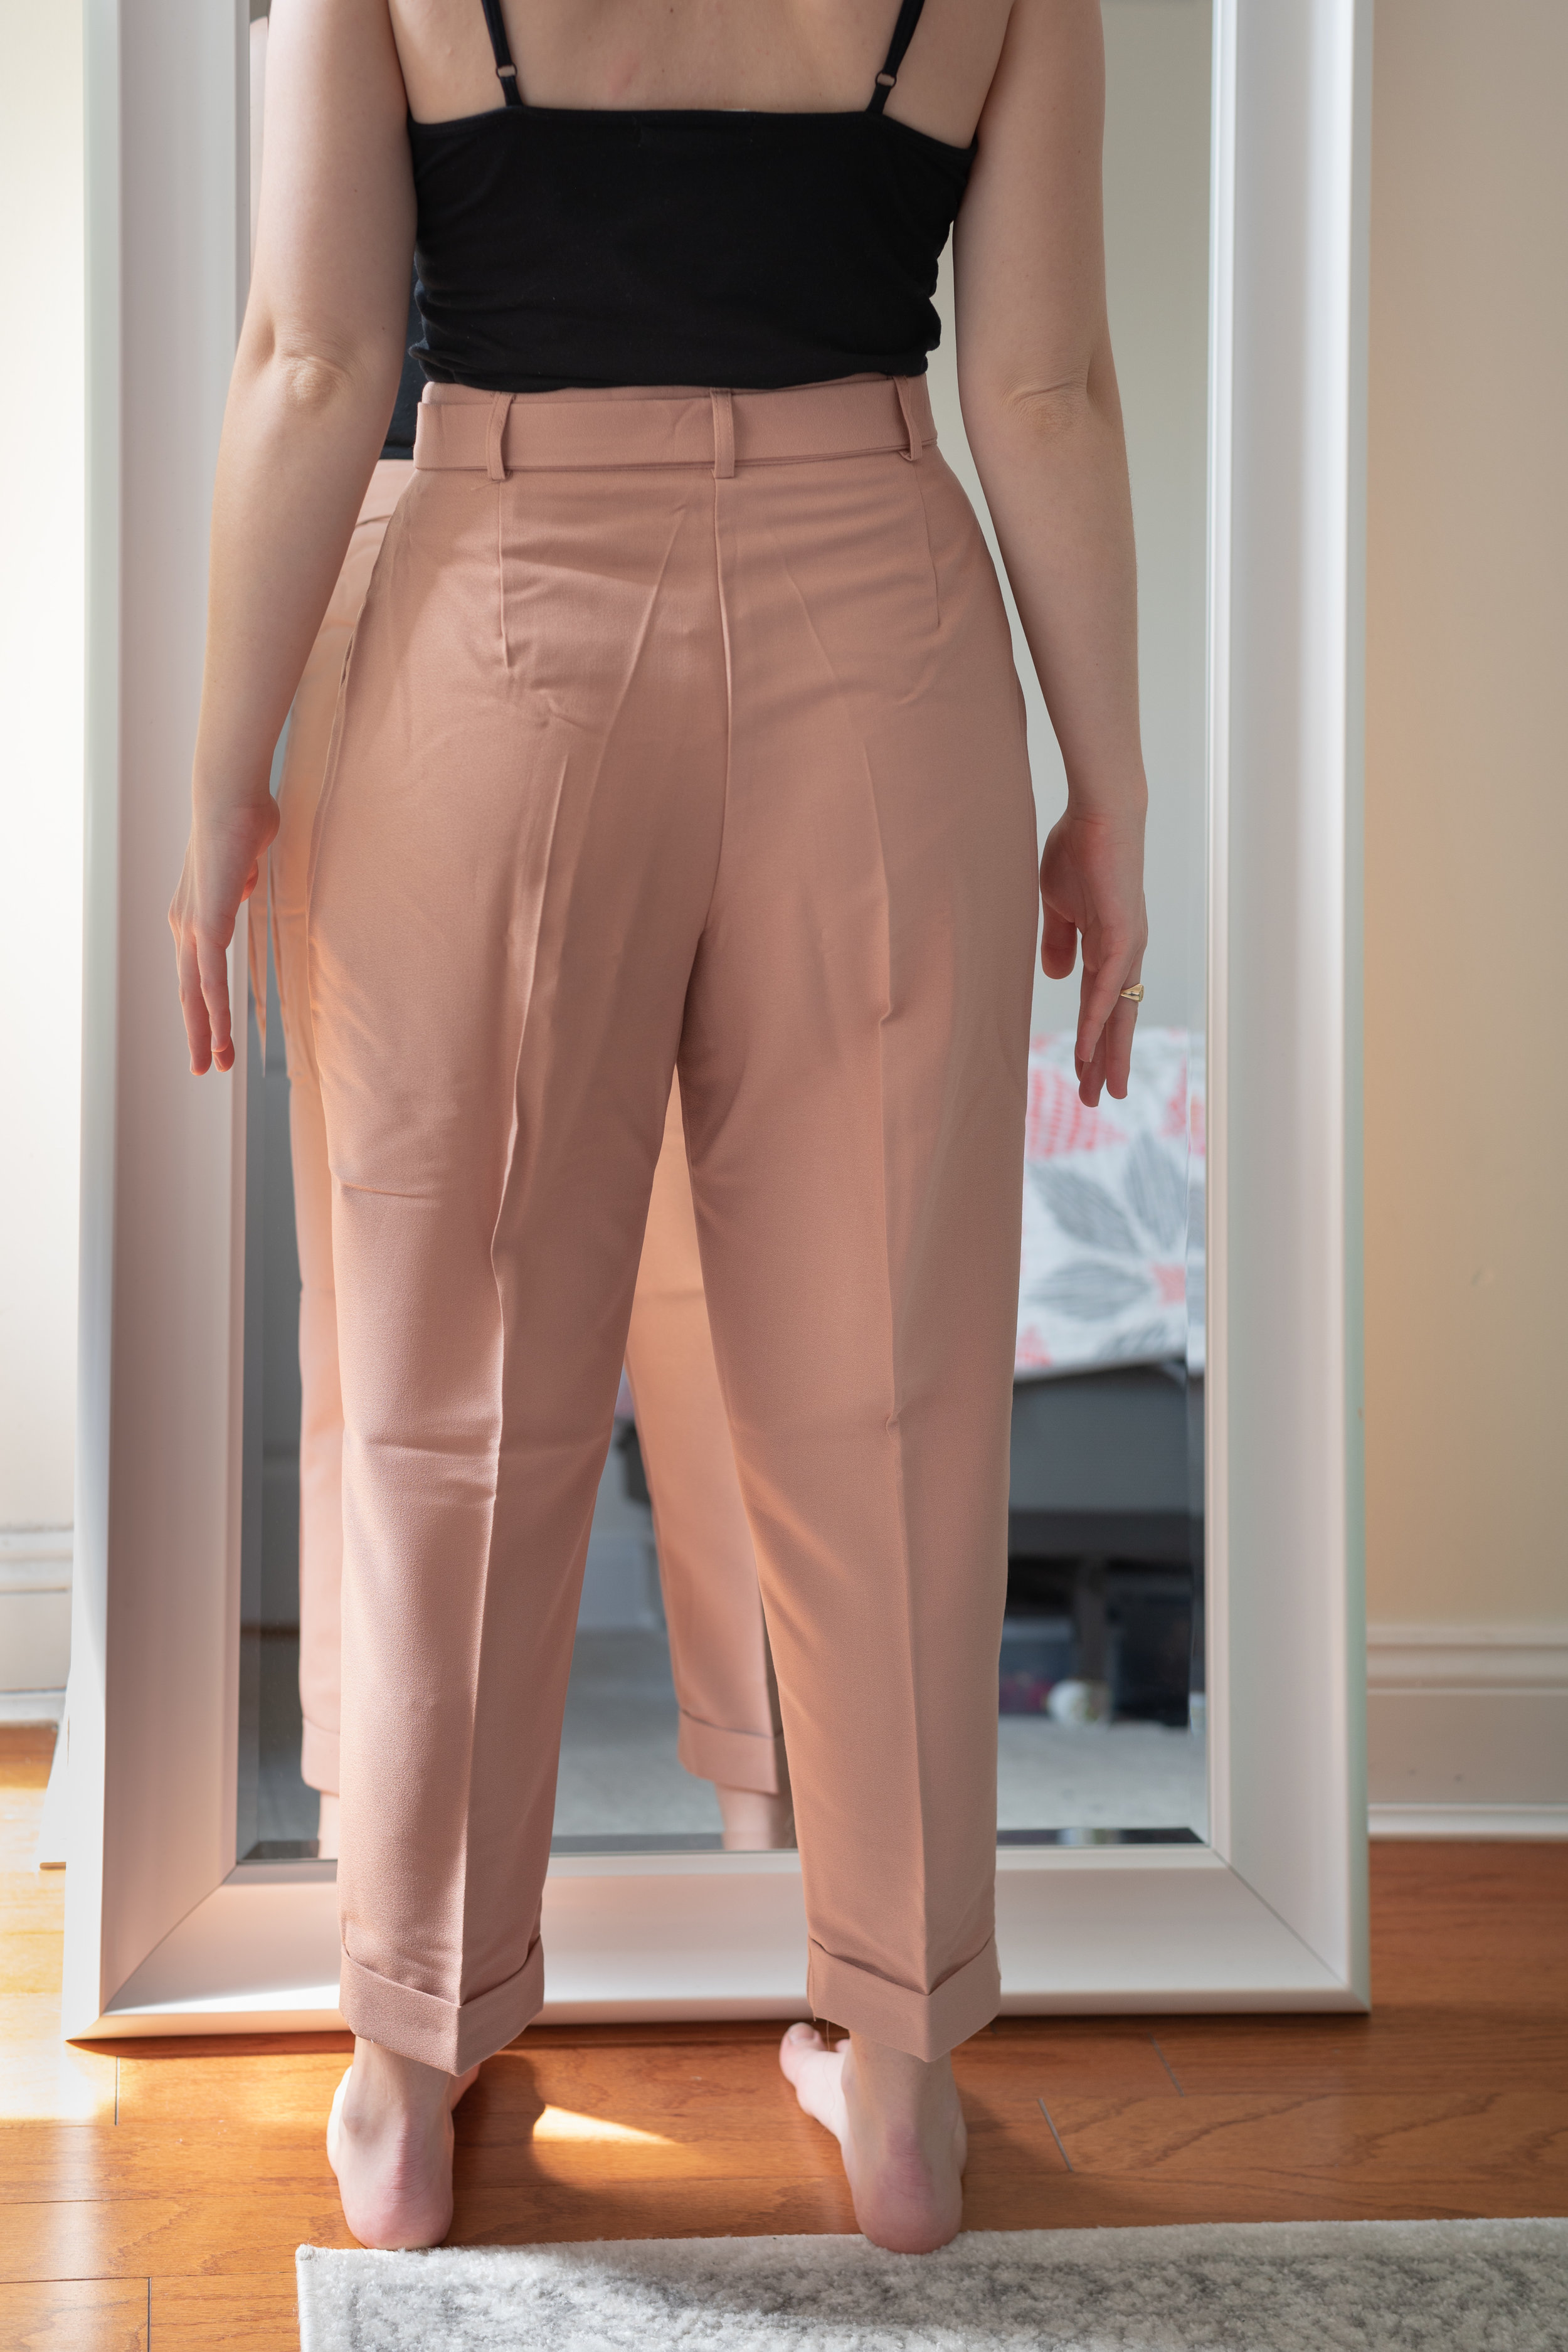 ASOS DESIGN Petite Woven Peg Pants with Obi Tie - Size 6 Petite